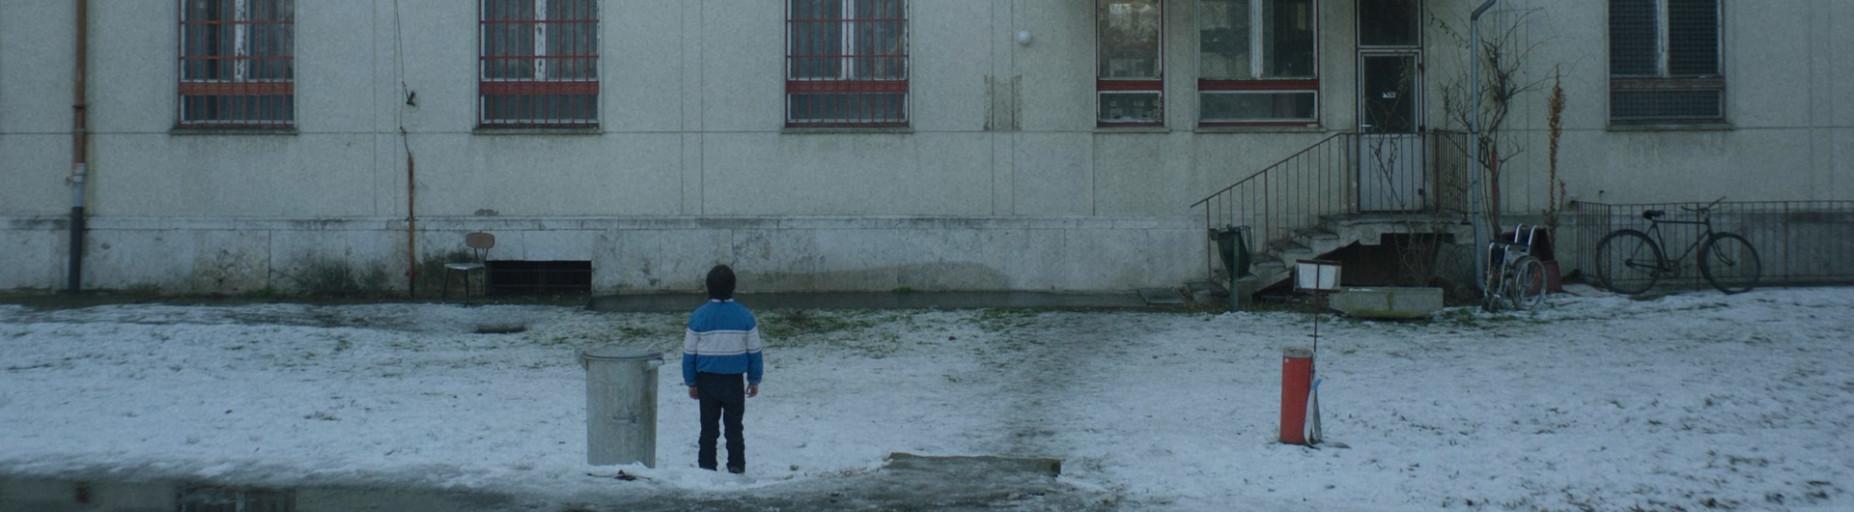 Magyar kisfilm versenyez Cannes-ban